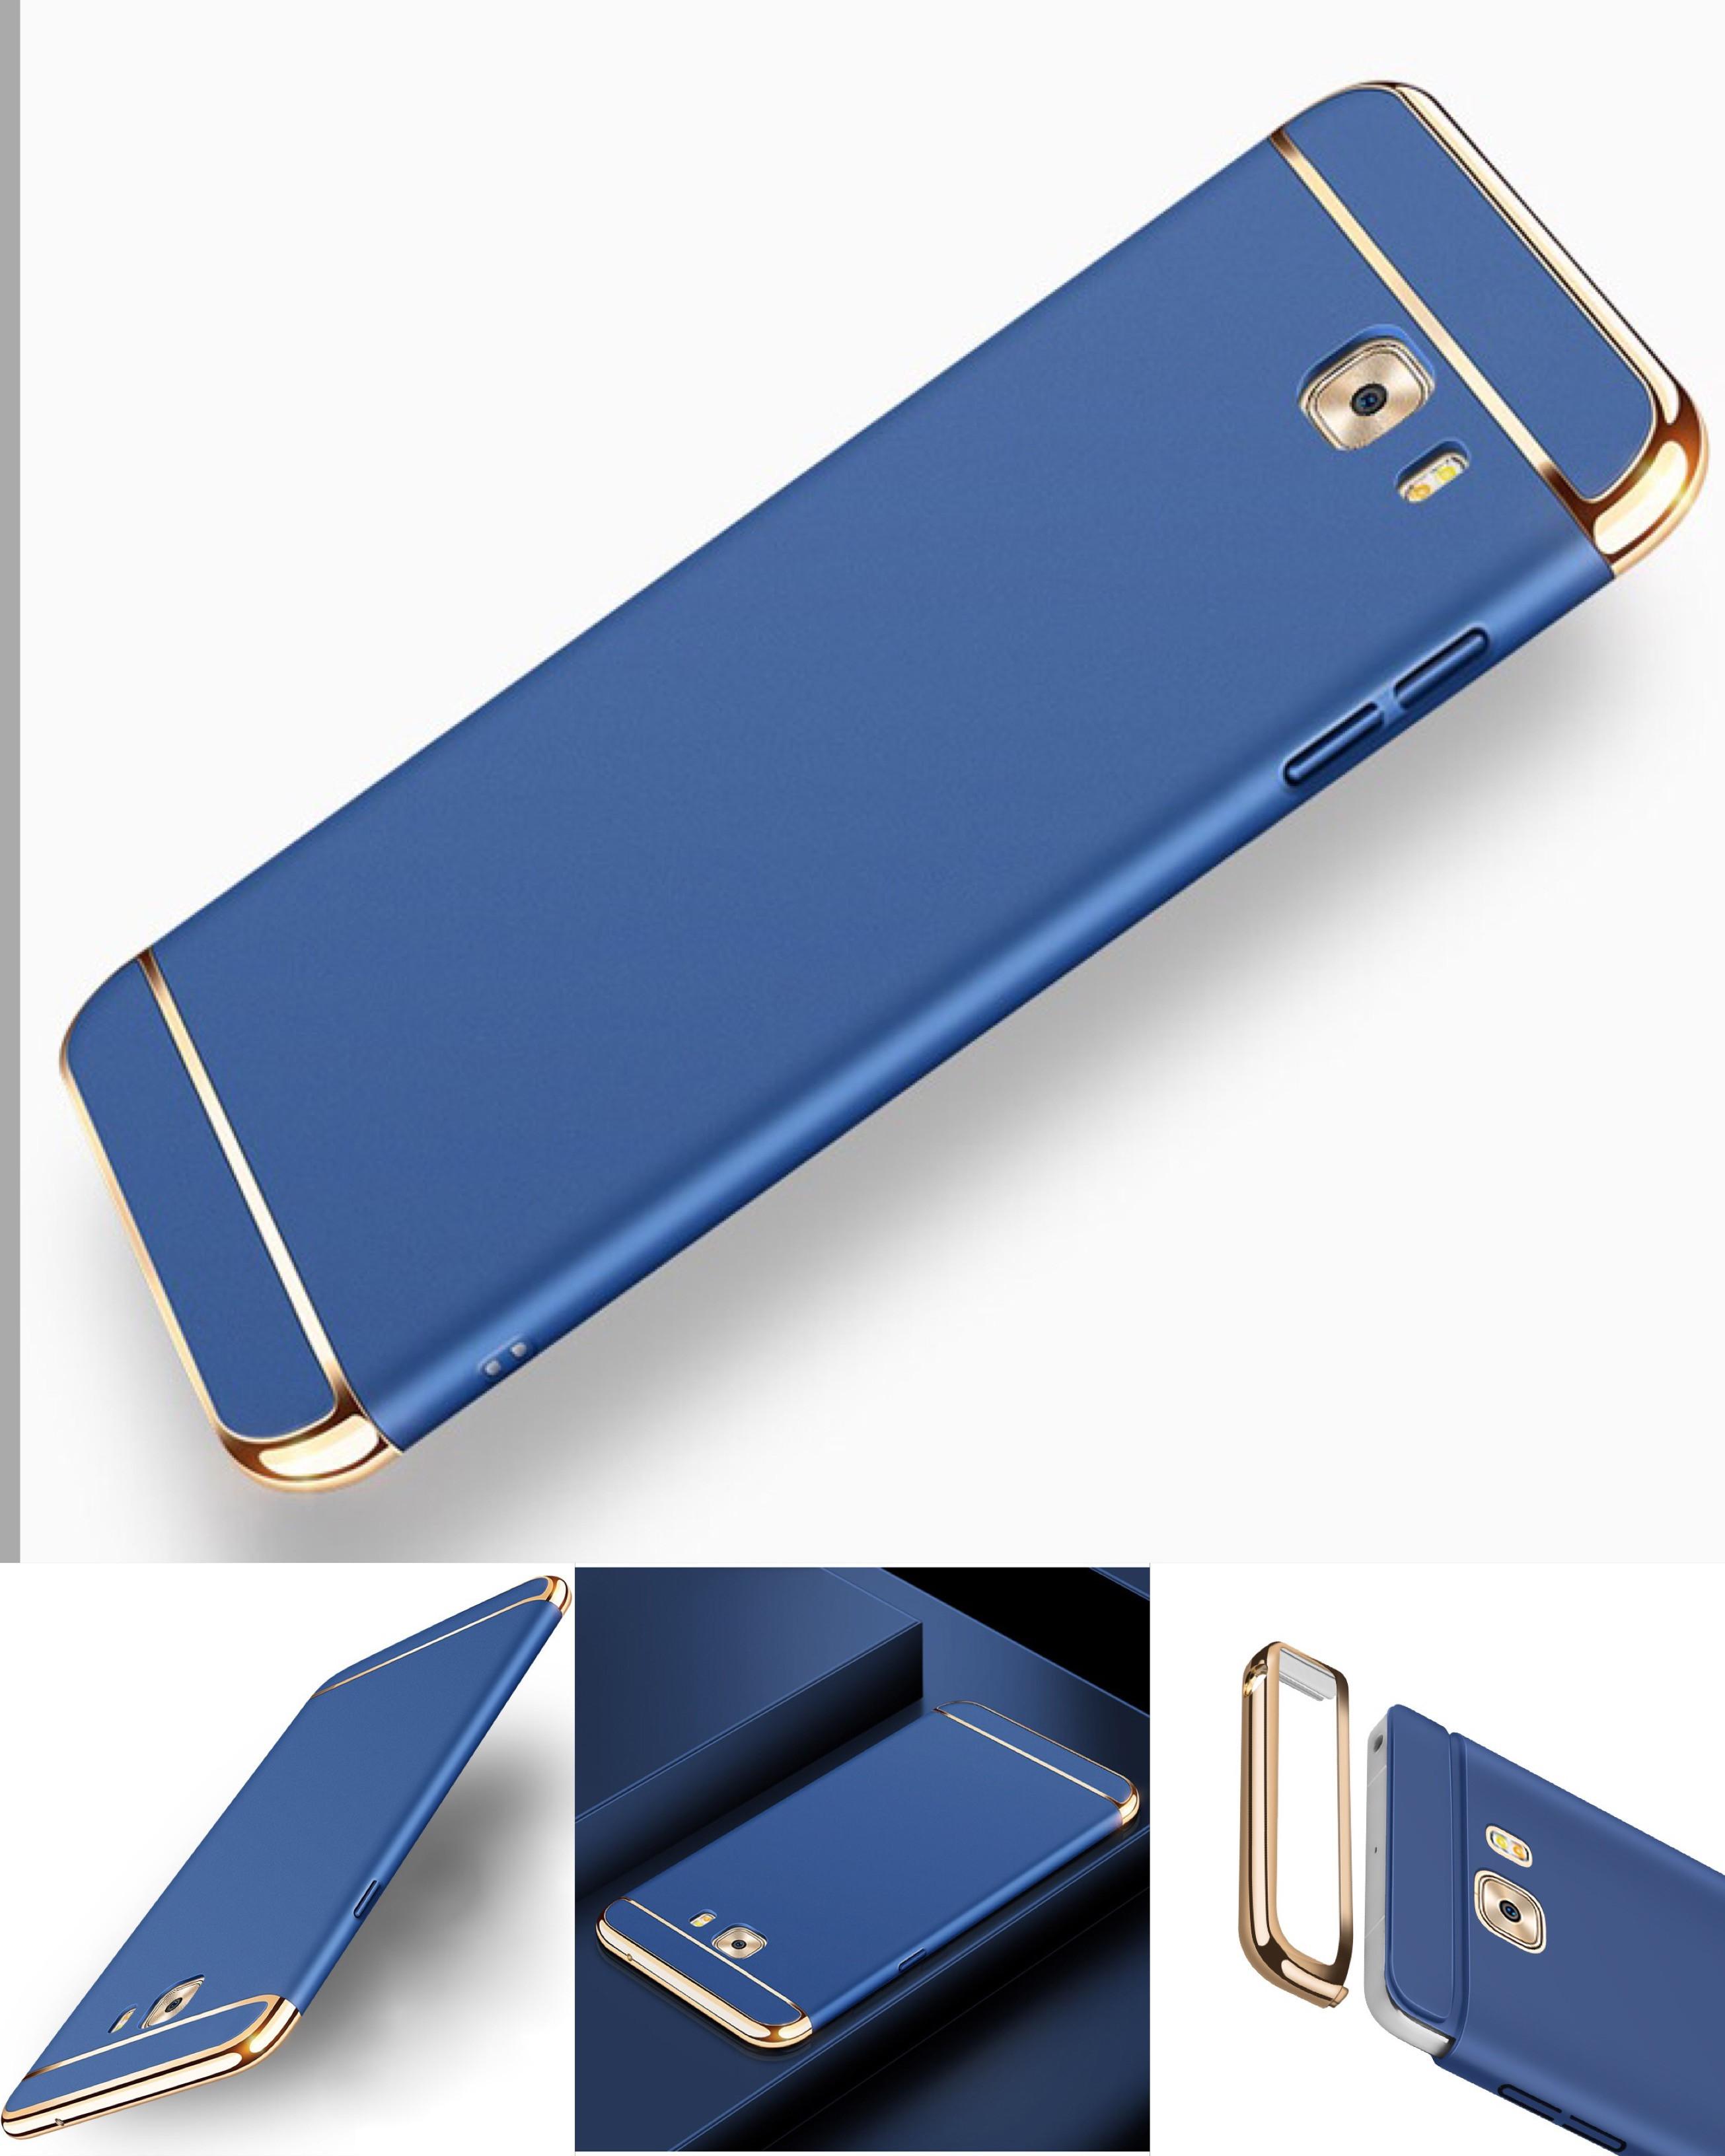 88+ Gambar Samsung Galaxy C9 Pro Terlihat Keren